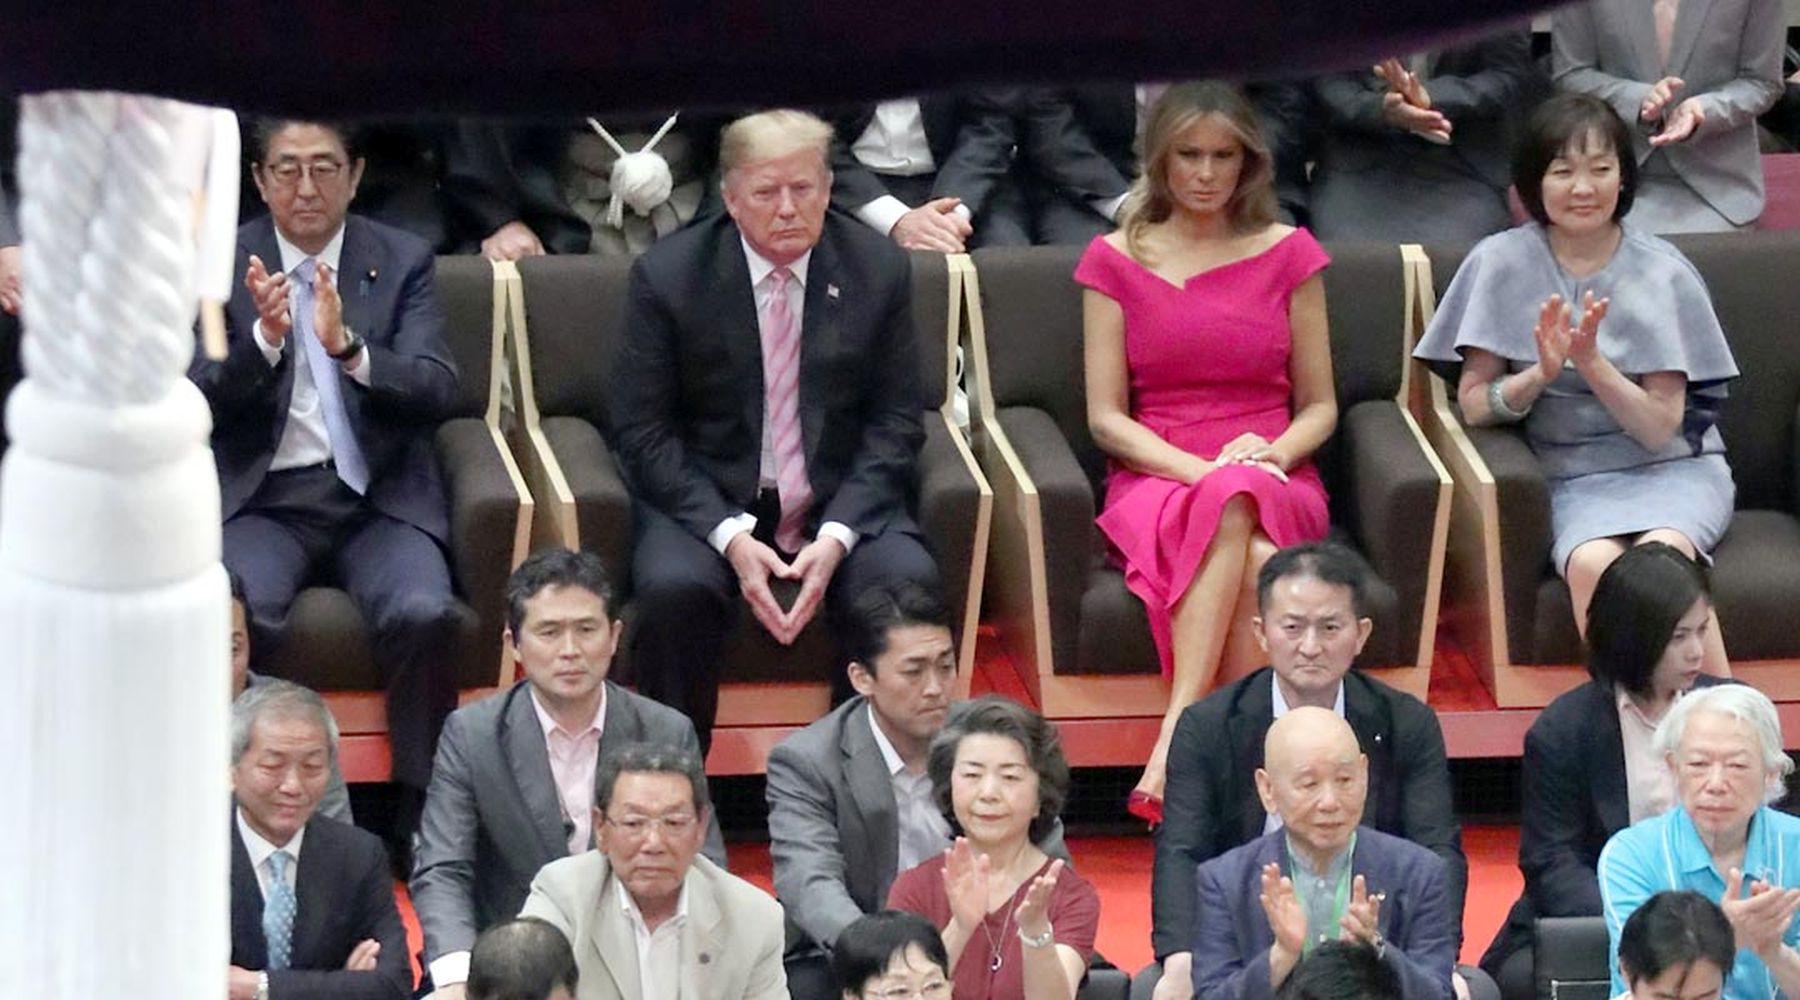 President Trump U.S. Cup to Japan Sumo Wrestler 004